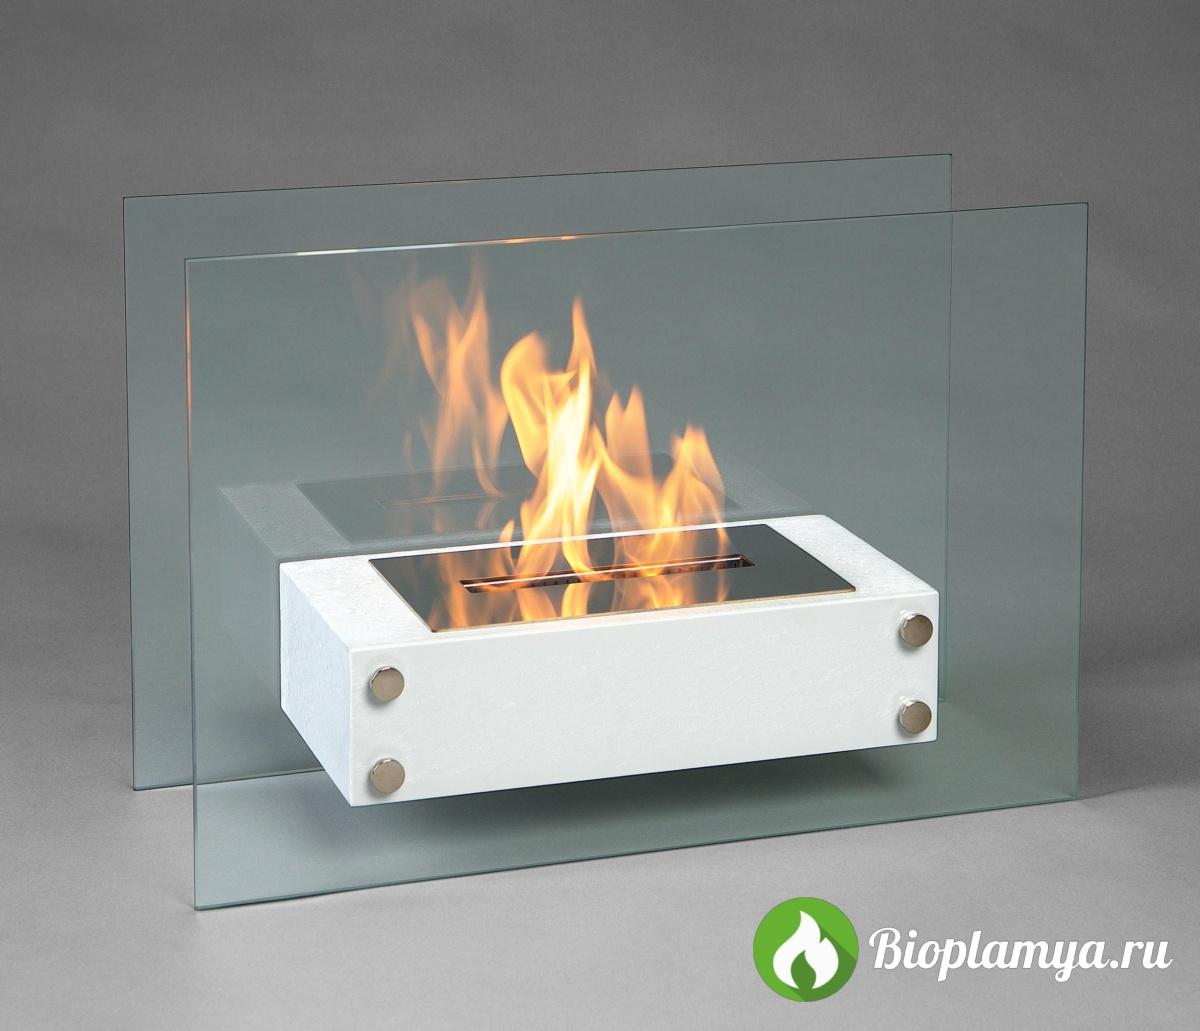 Напольный-биокамин-для-квартиры-Standart-White-Silver-Smith-Bioplamya.jpg